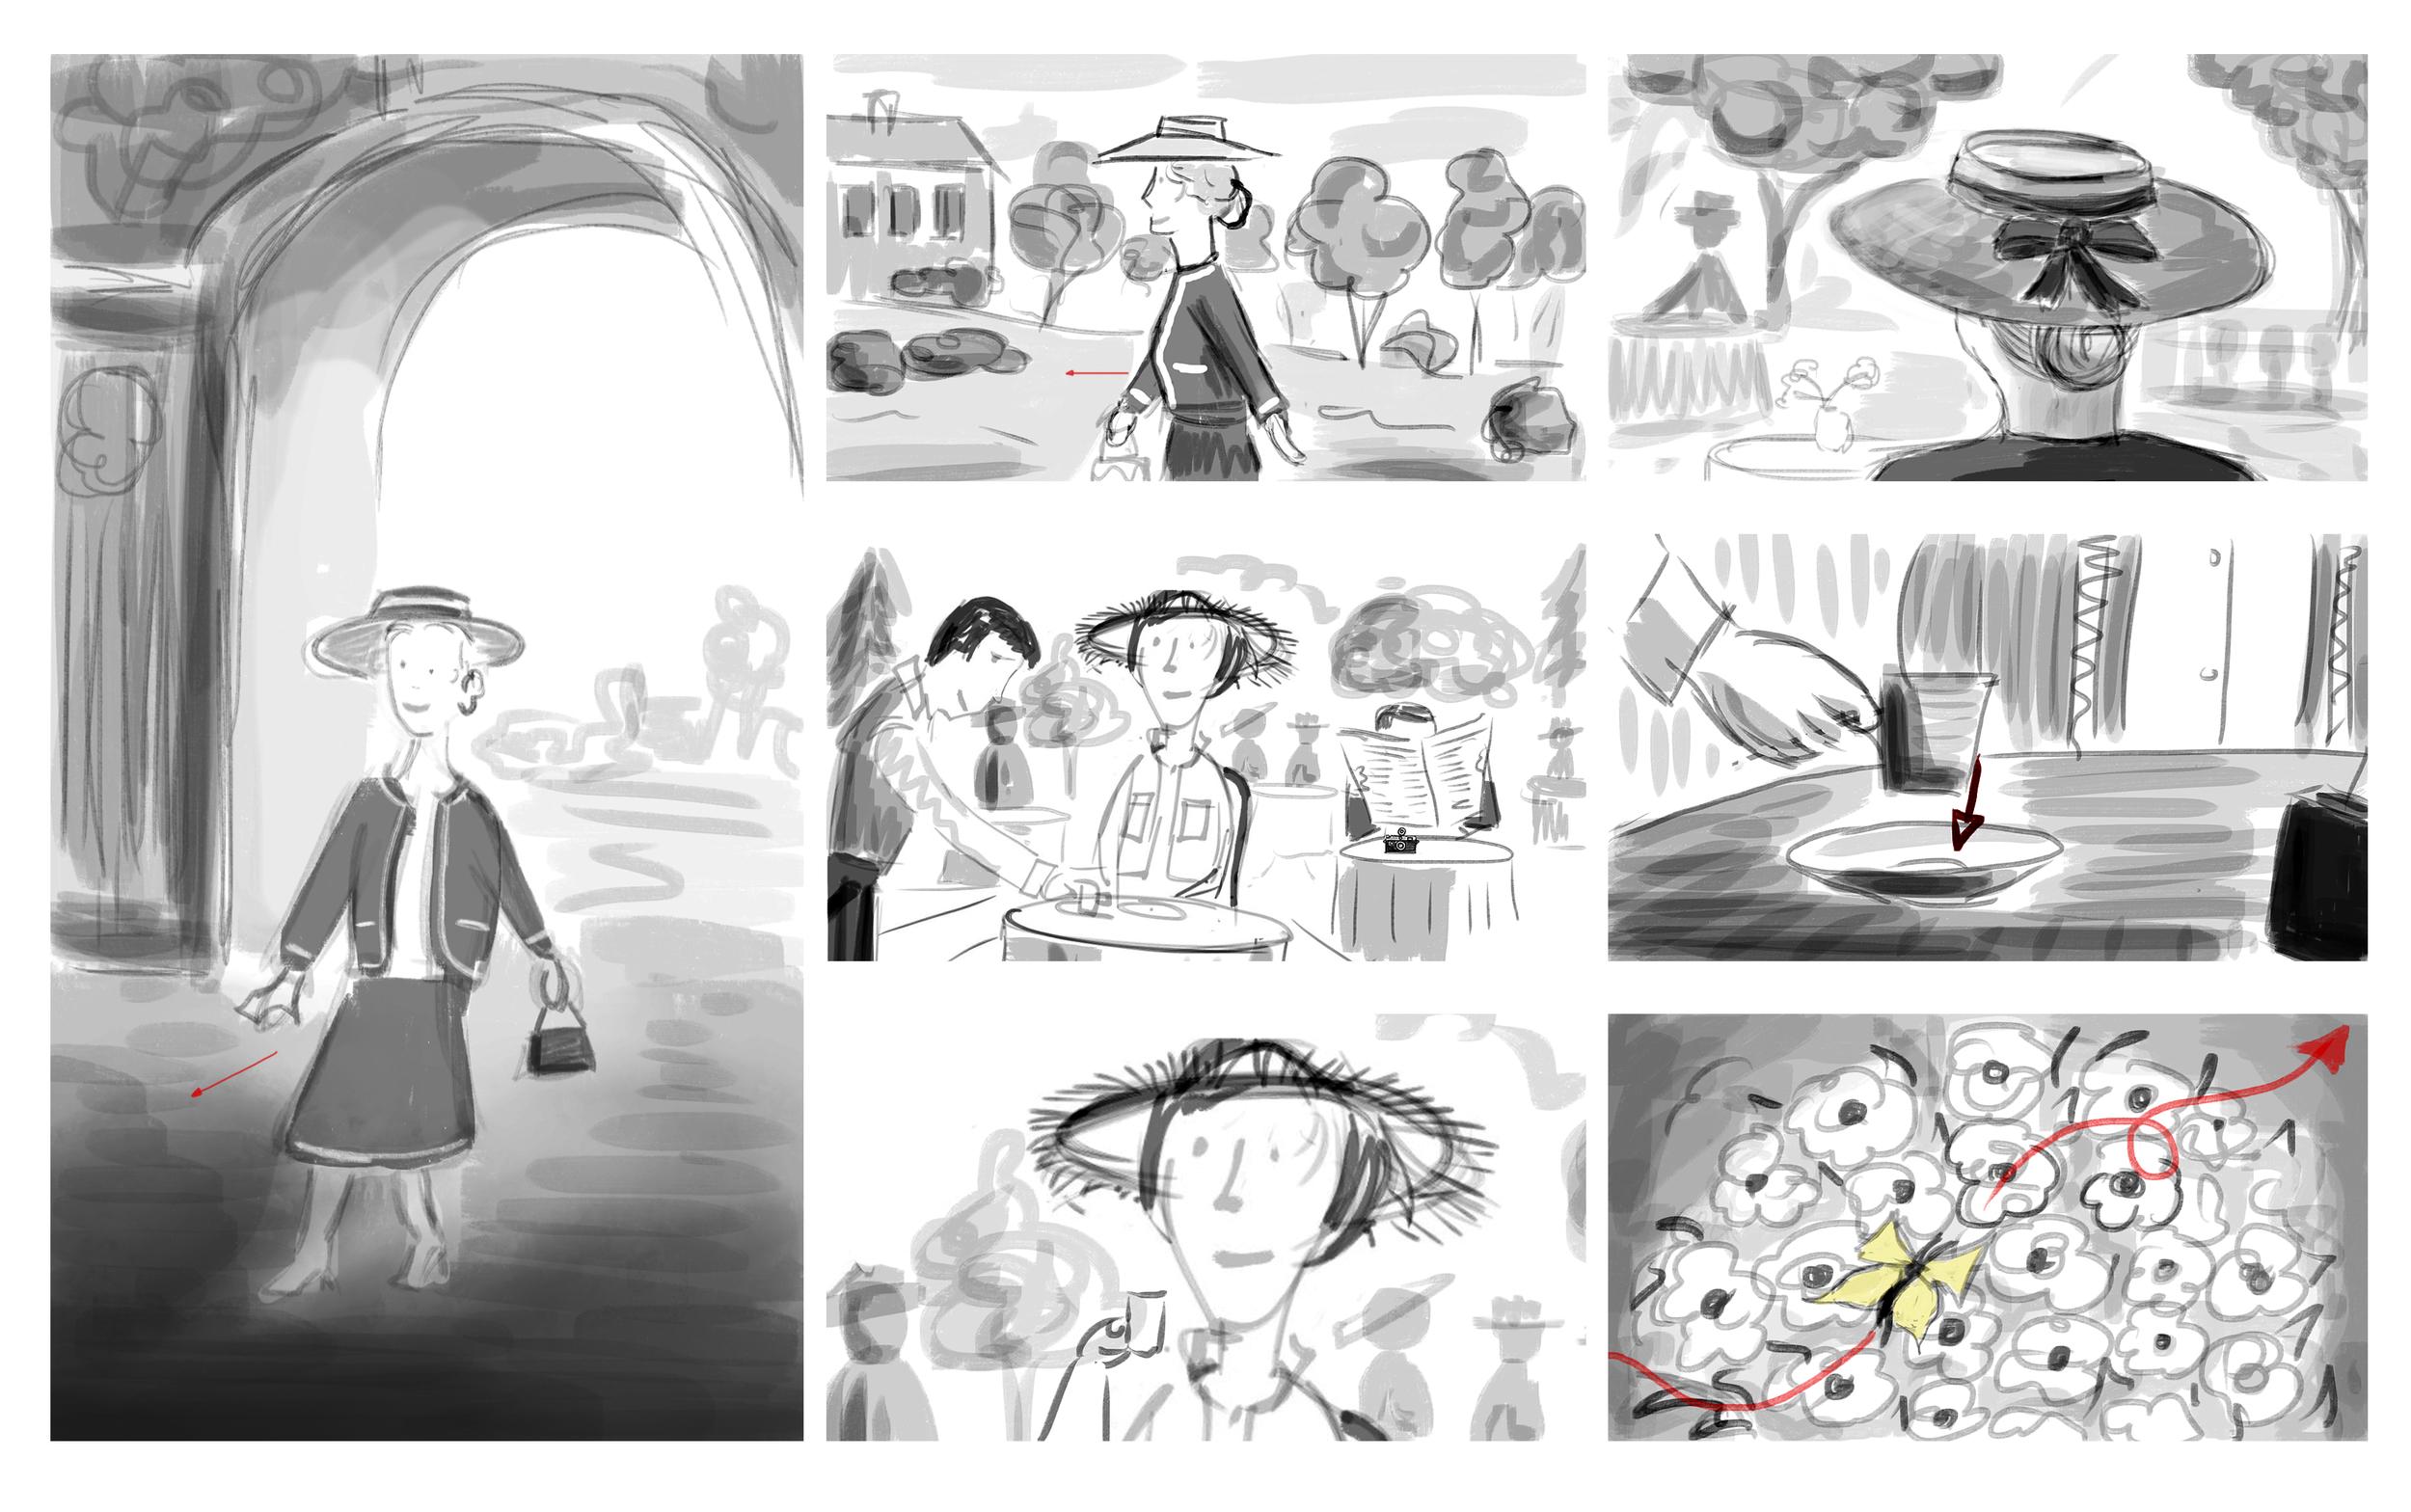 Storyboards by Feli di Giorgio